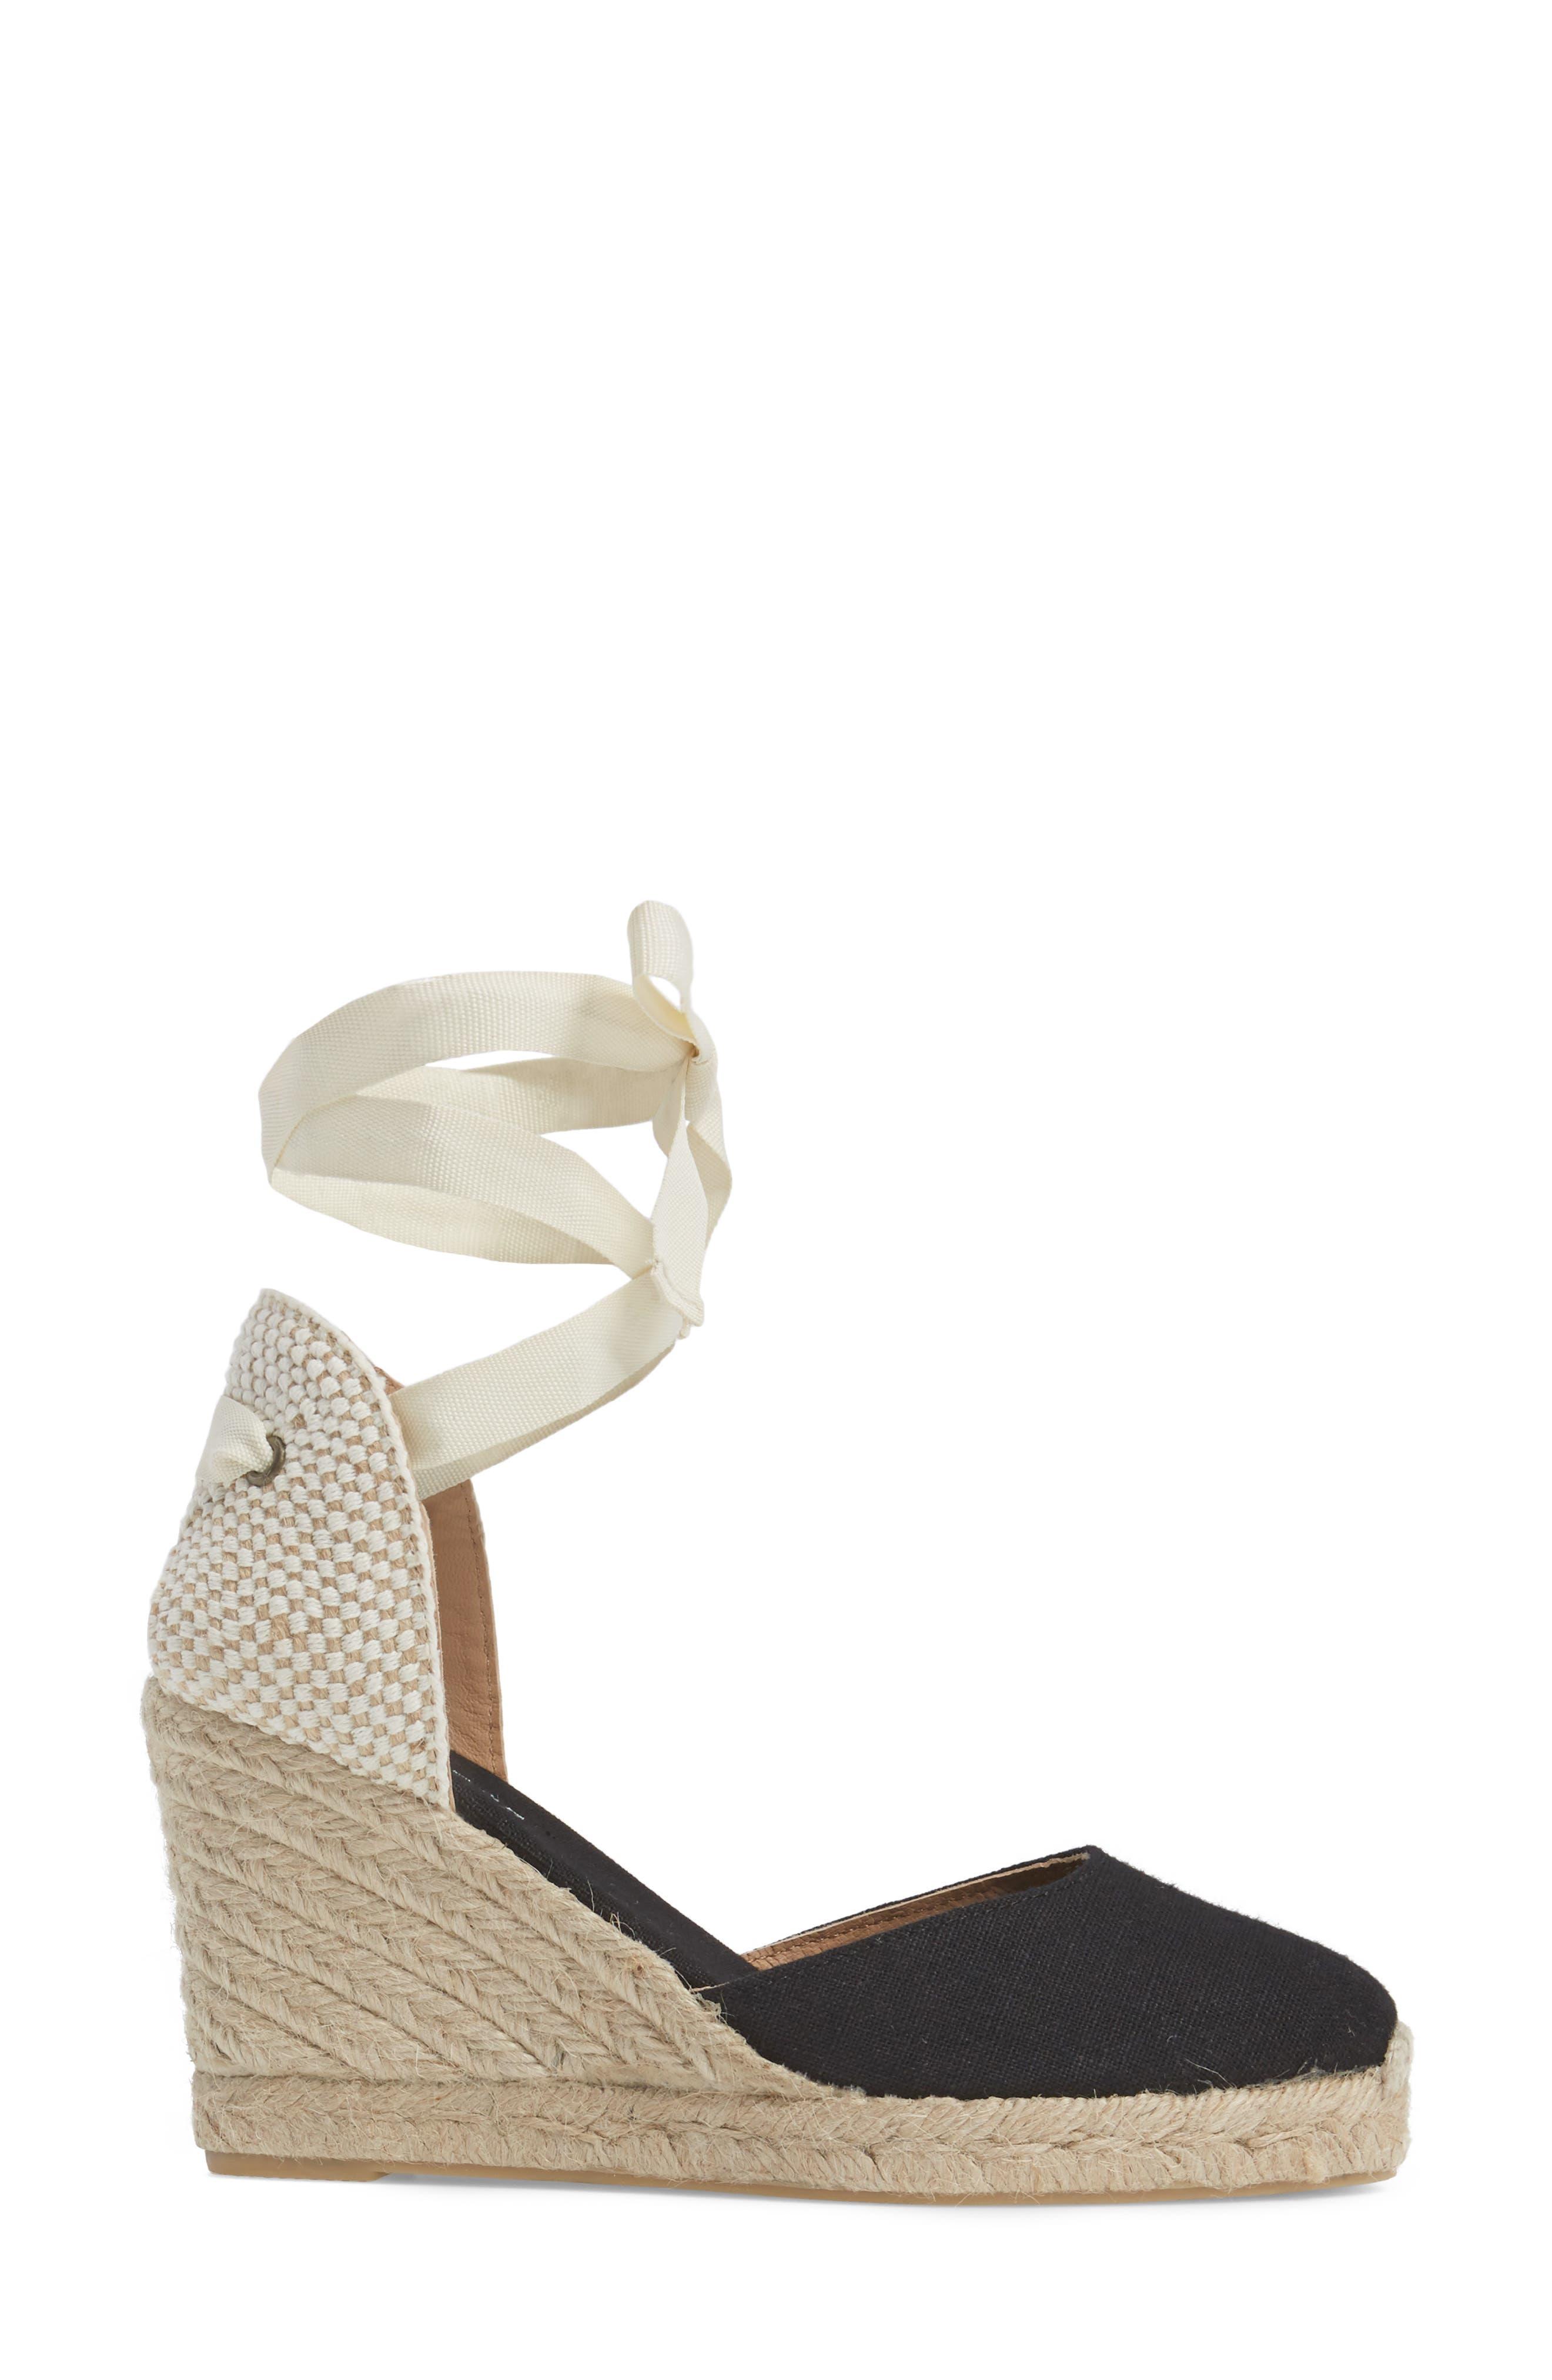 Alternate Image 3  - Soludos Wedge Lace-Up Espadrille Sandal (Women)